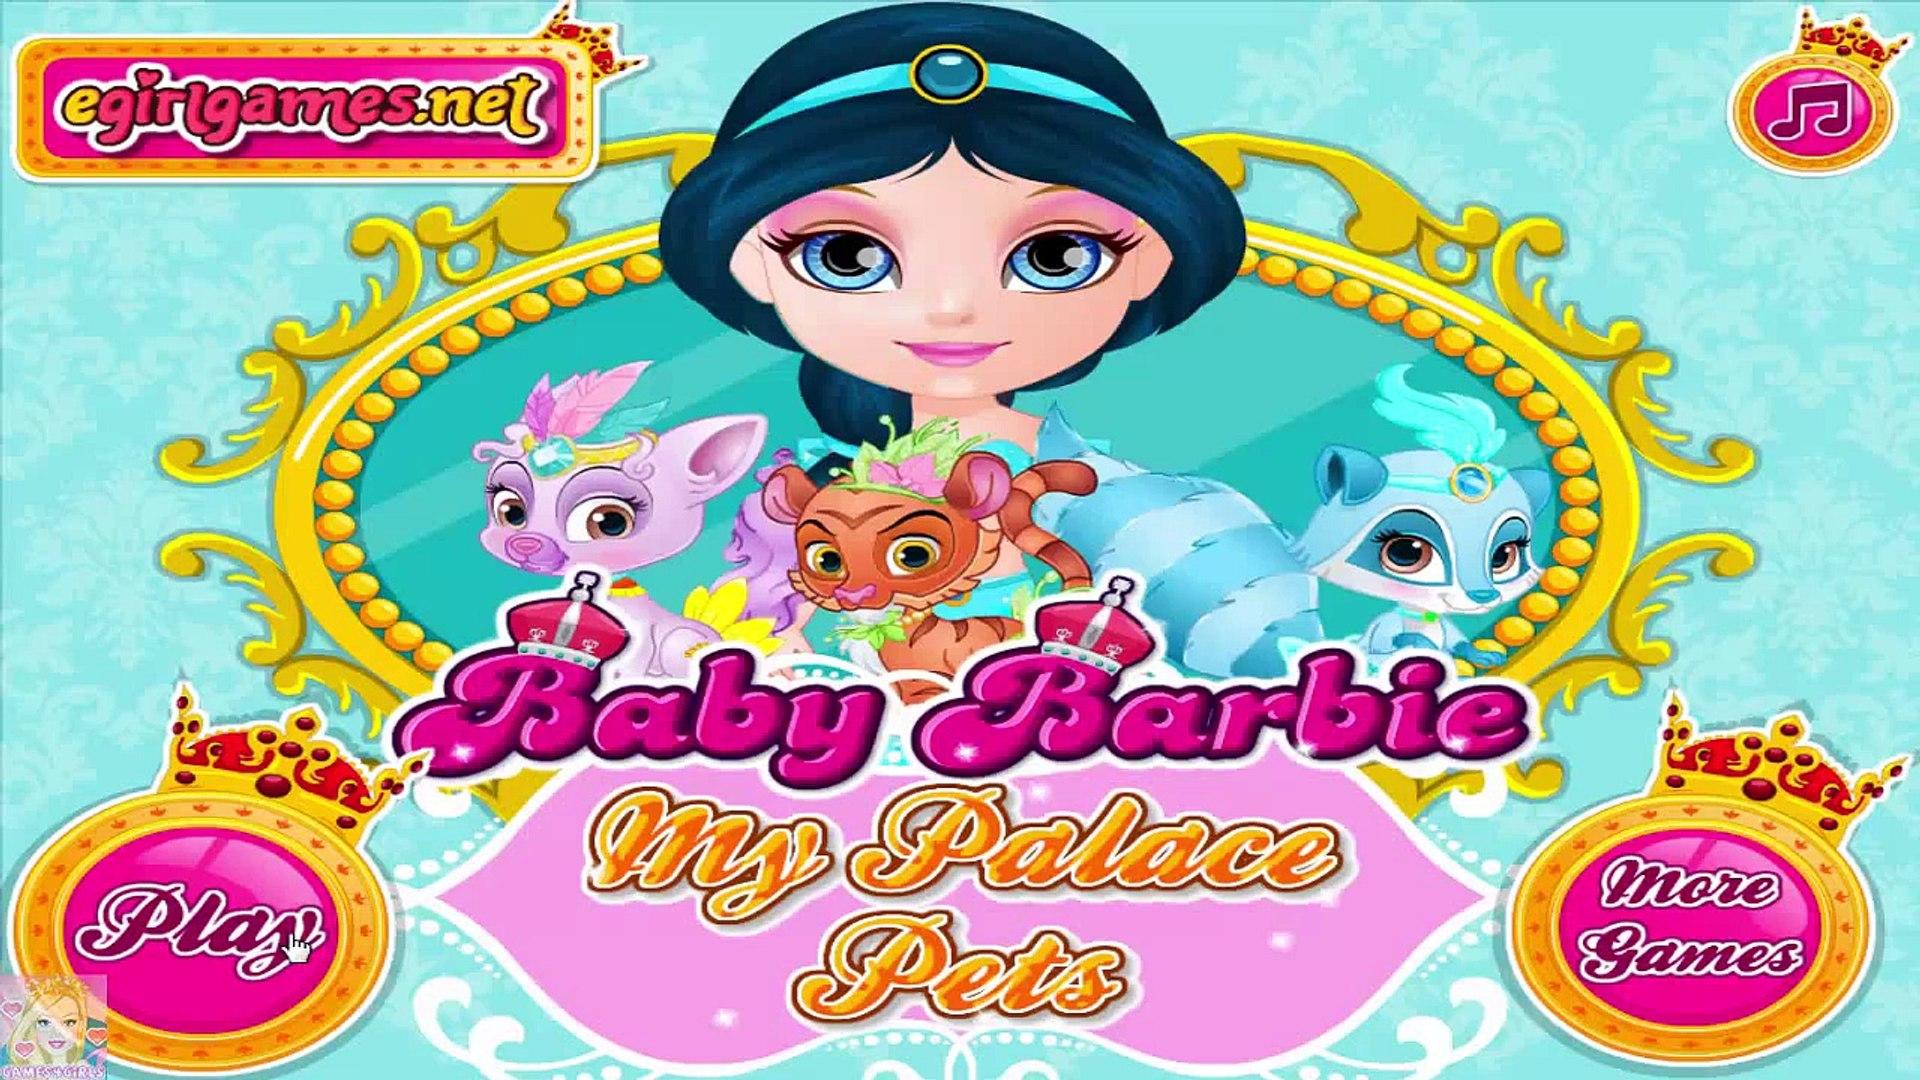 Baby Barbie My Palace Pets Princess Barbie Palace Pets Care Game for Kids